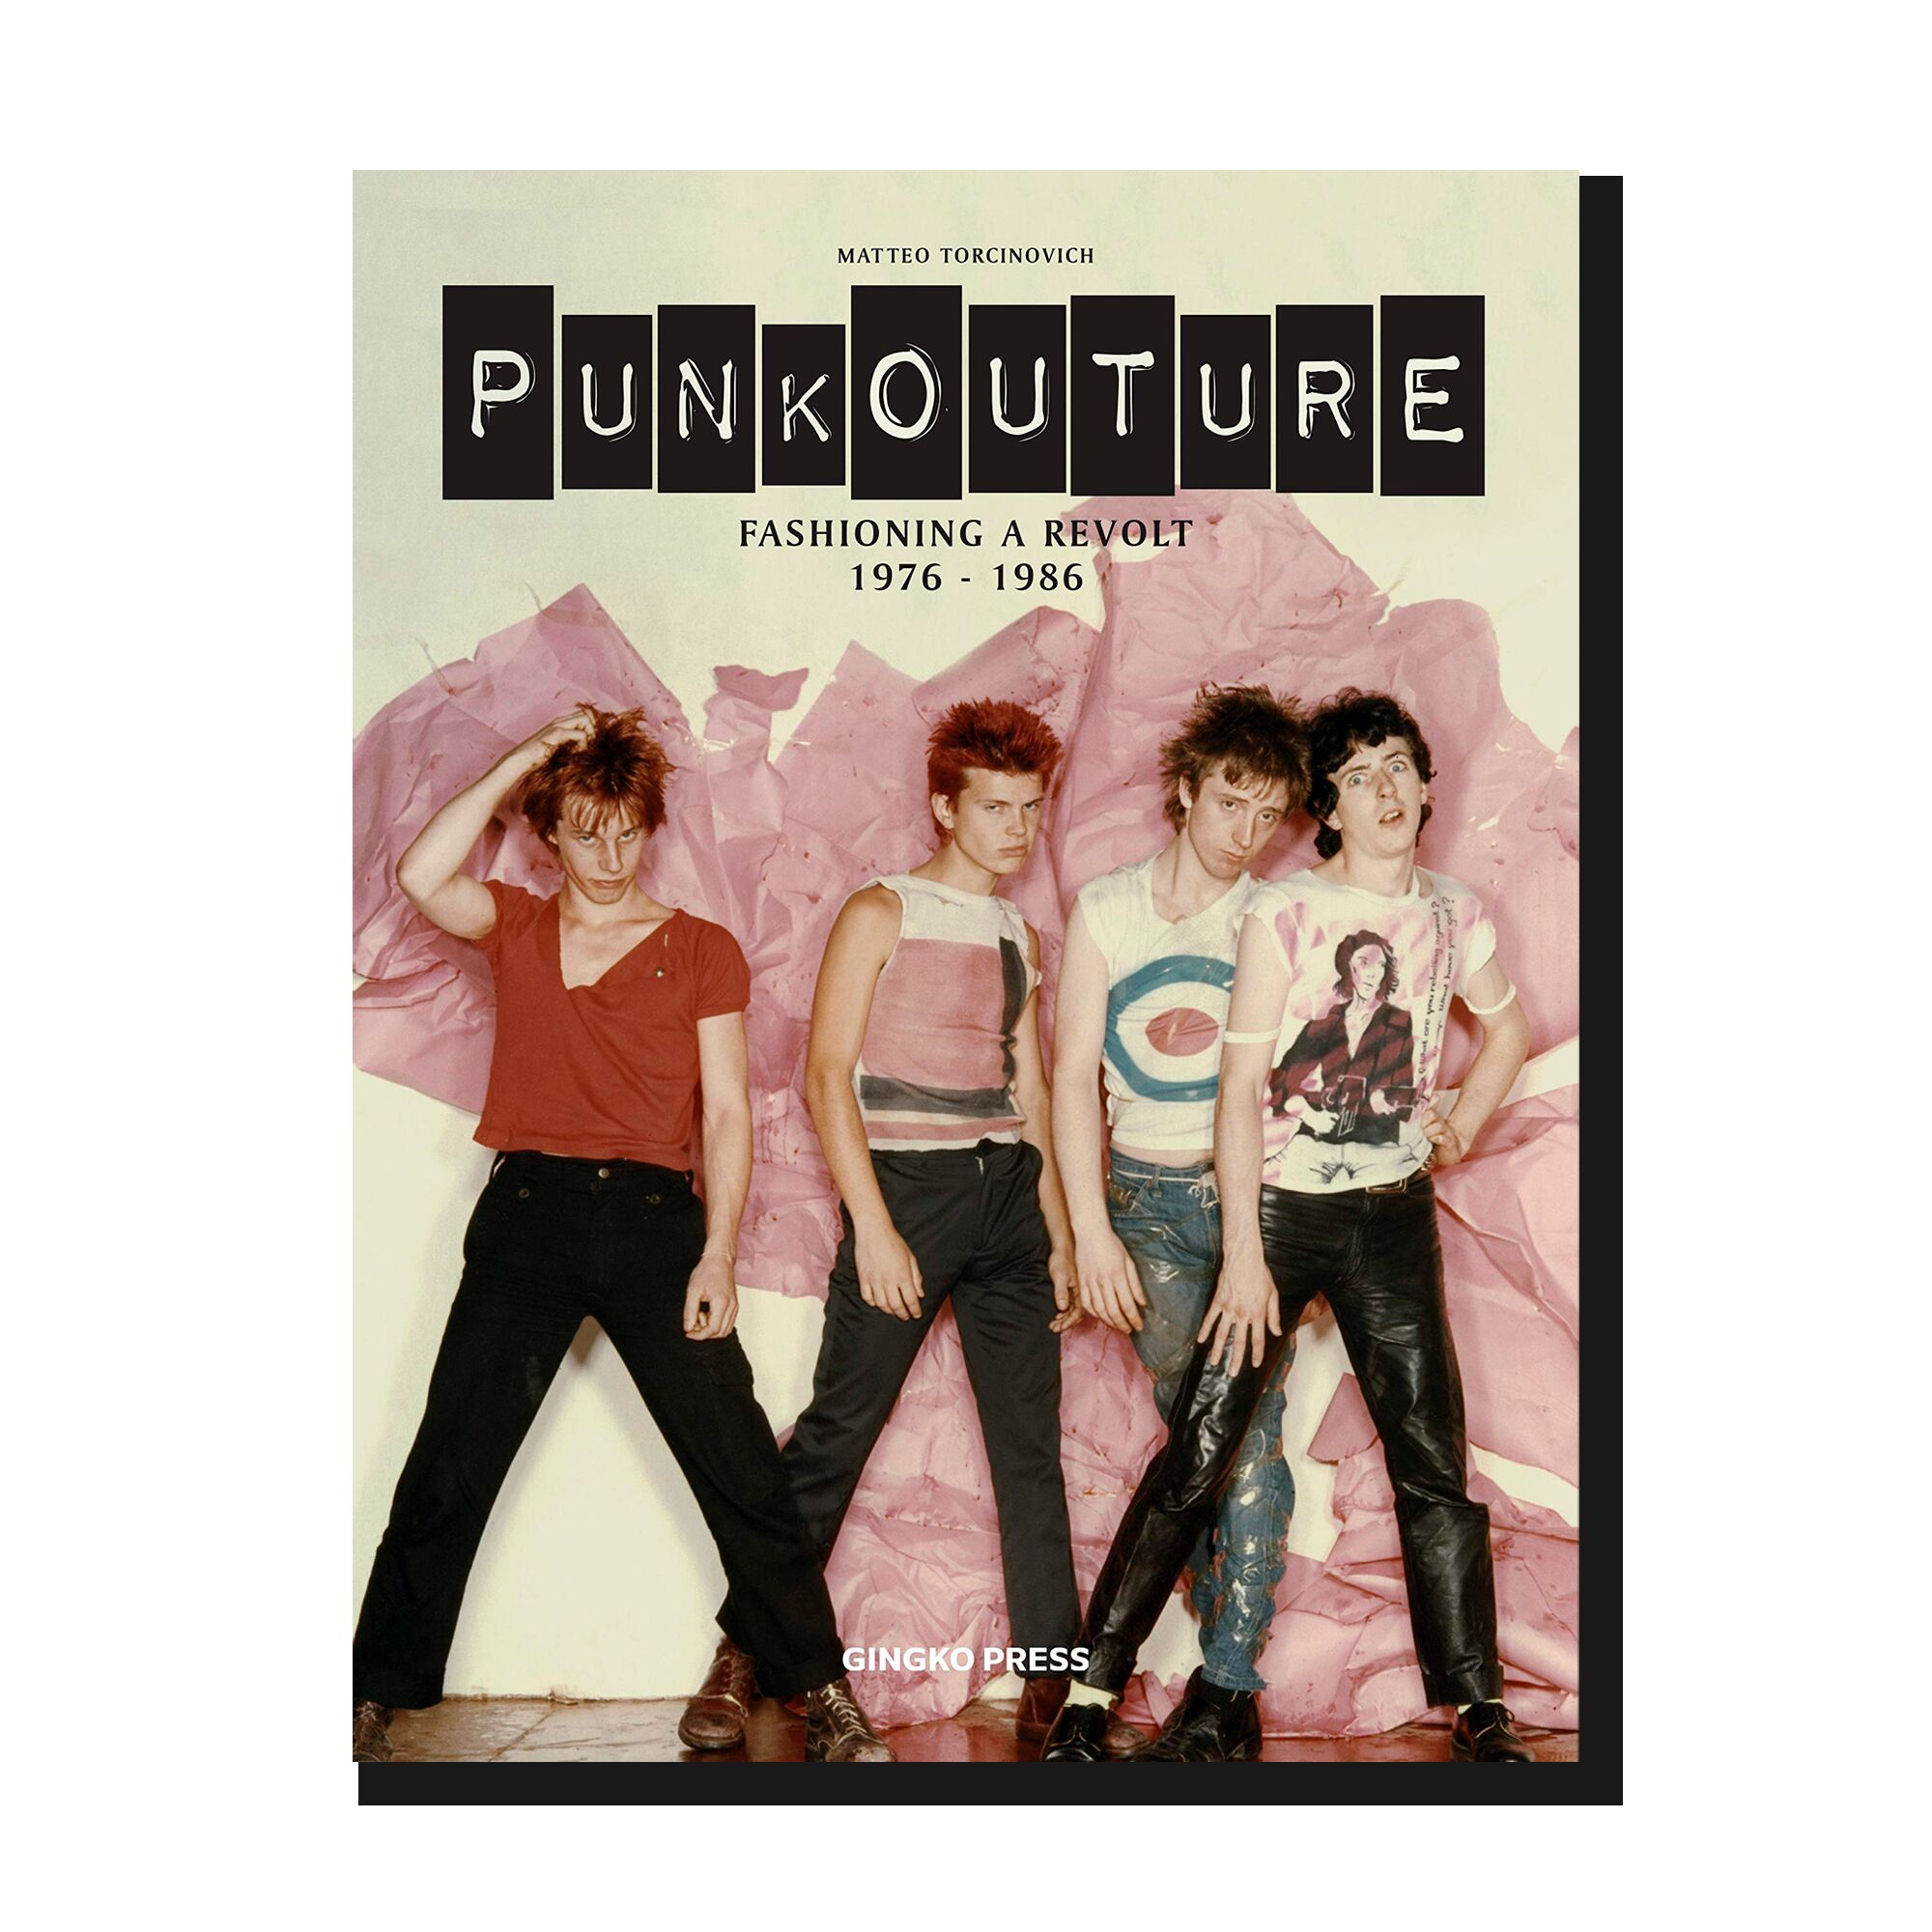 Punkouture: Fashioning a Revolt 1976 to 1986